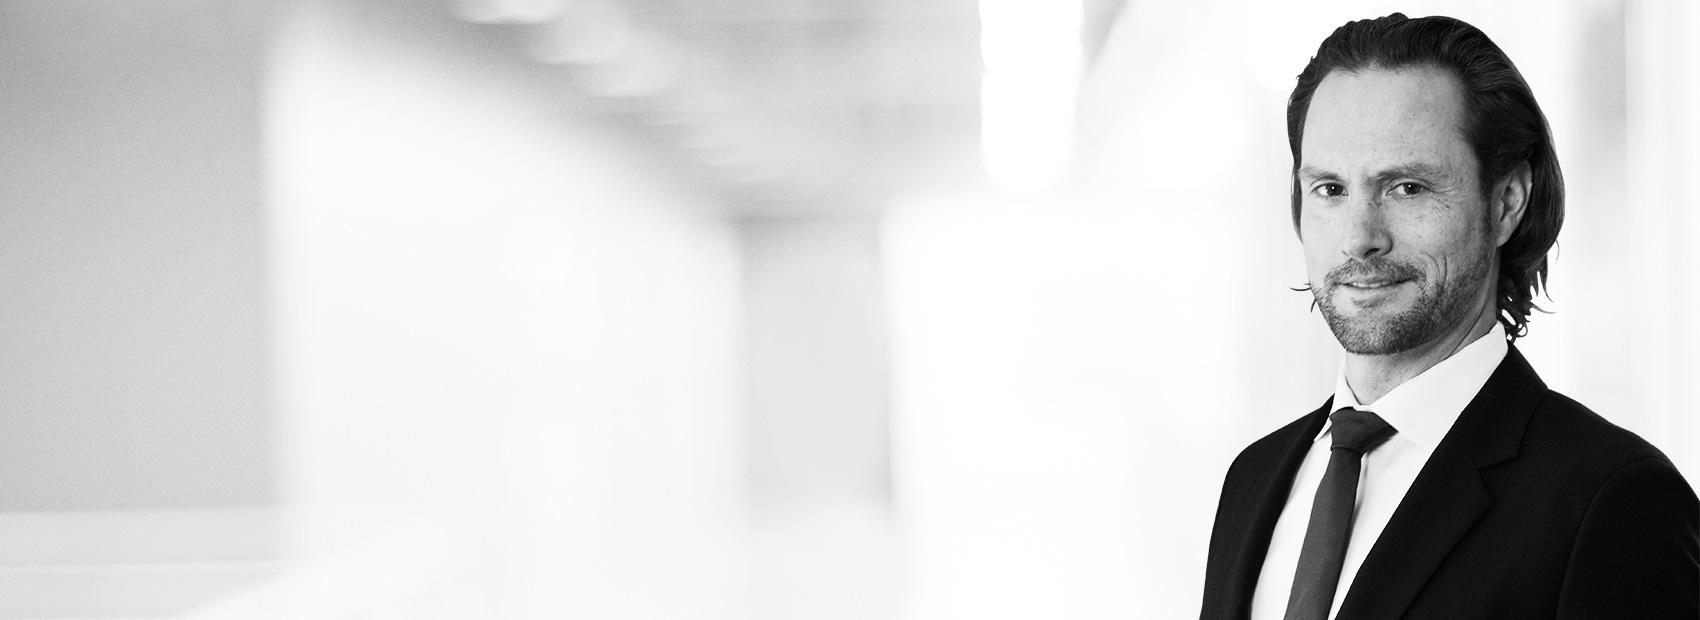 Title Image